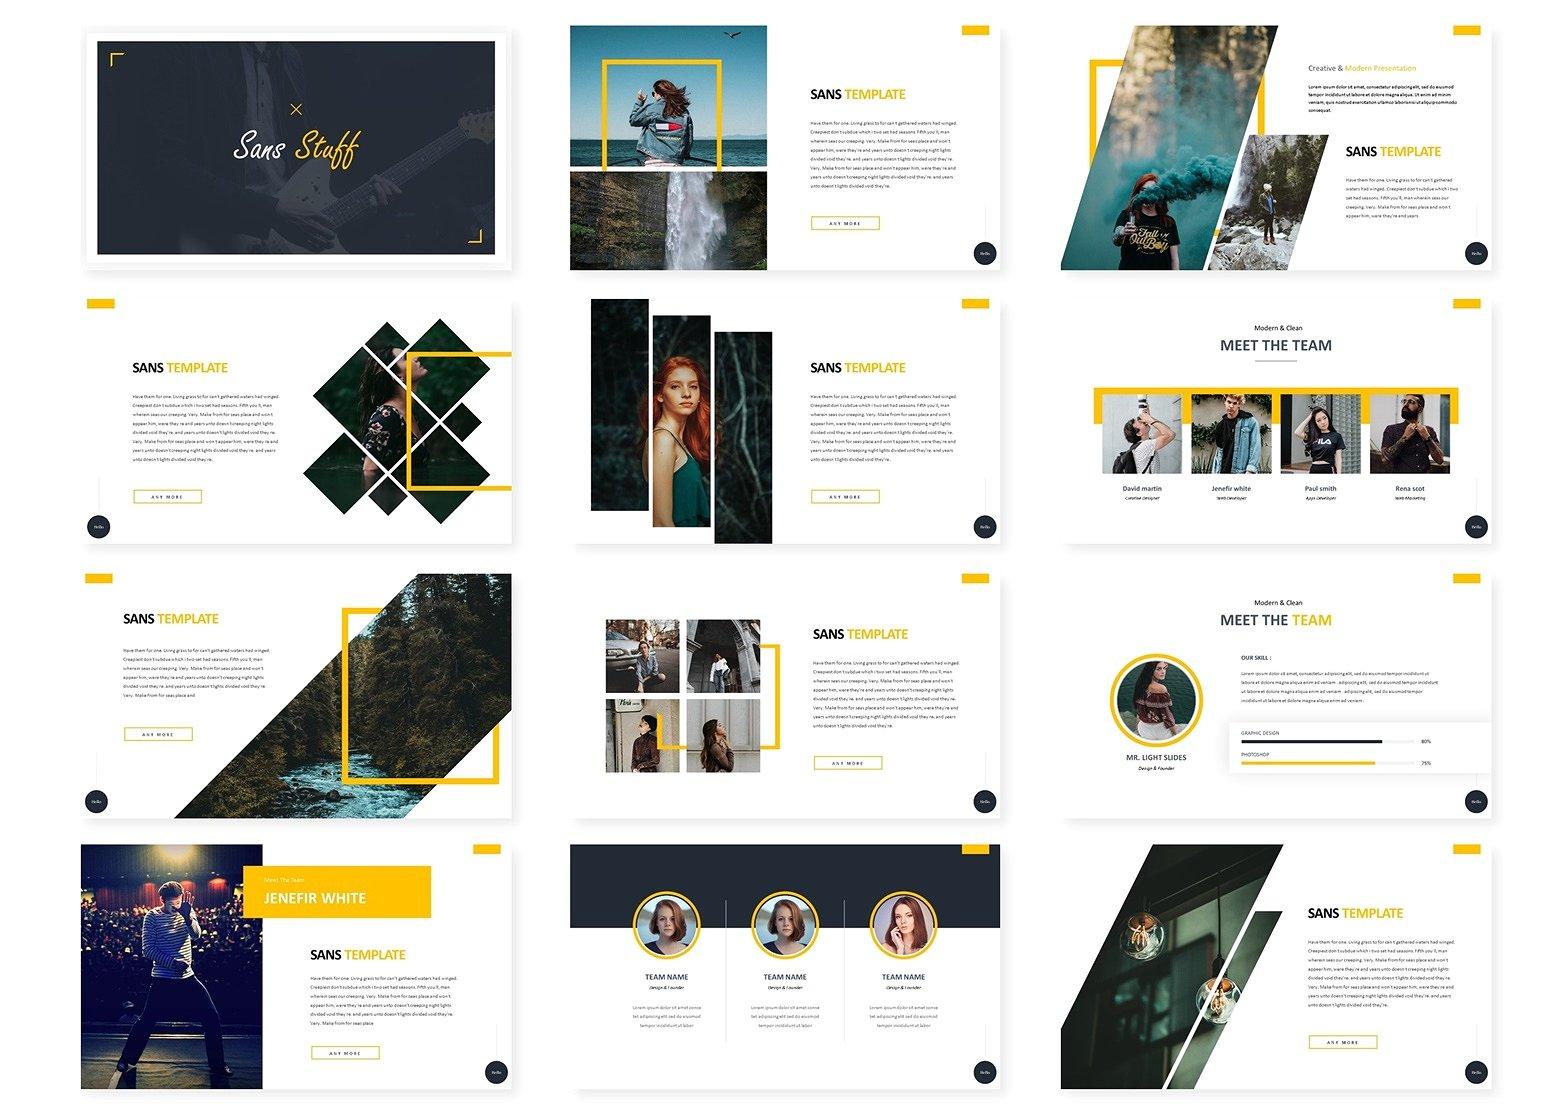 几何图形分割布局的企业介绍幻灯片模板 Corporate Presentation Slide Template For Geometric Segmentation Layout插图1